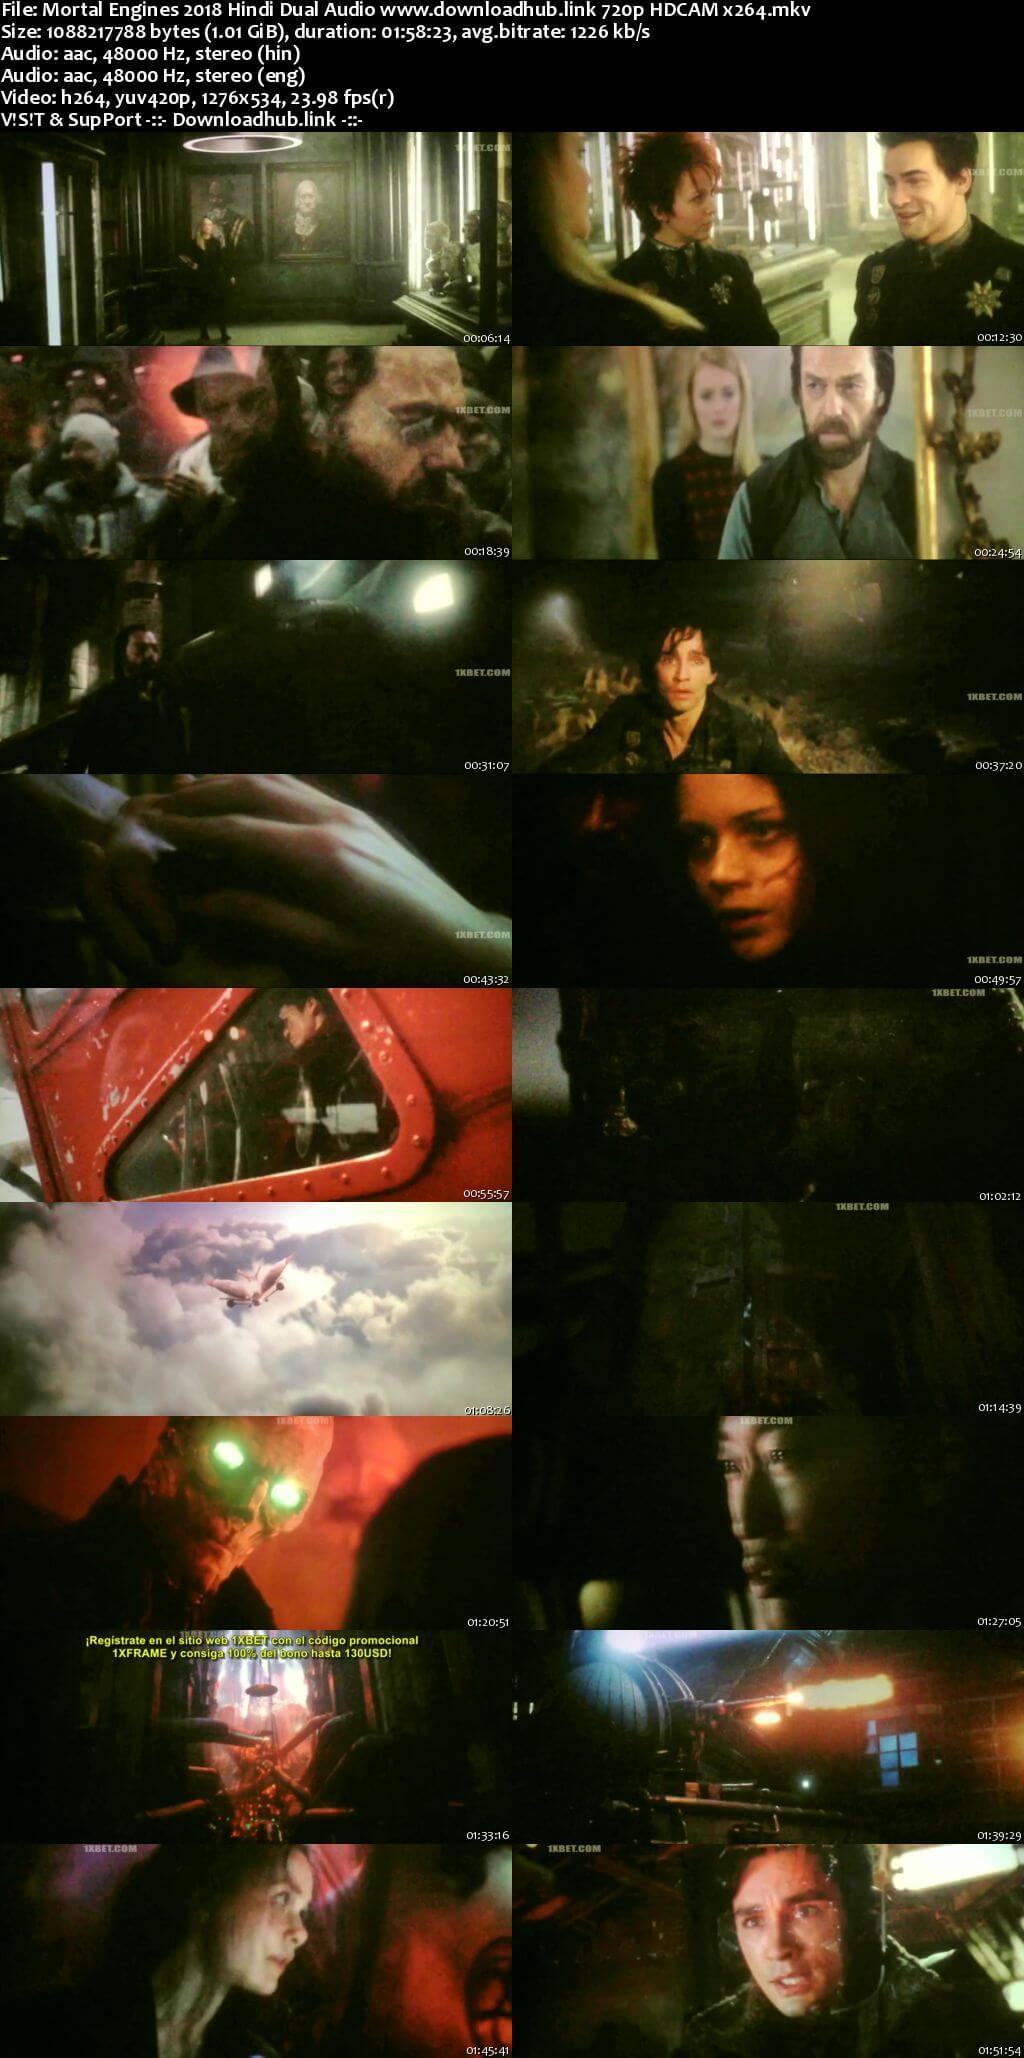 Mortal Engines 2018 Hindi Dual Audio 720p HDCAM x264